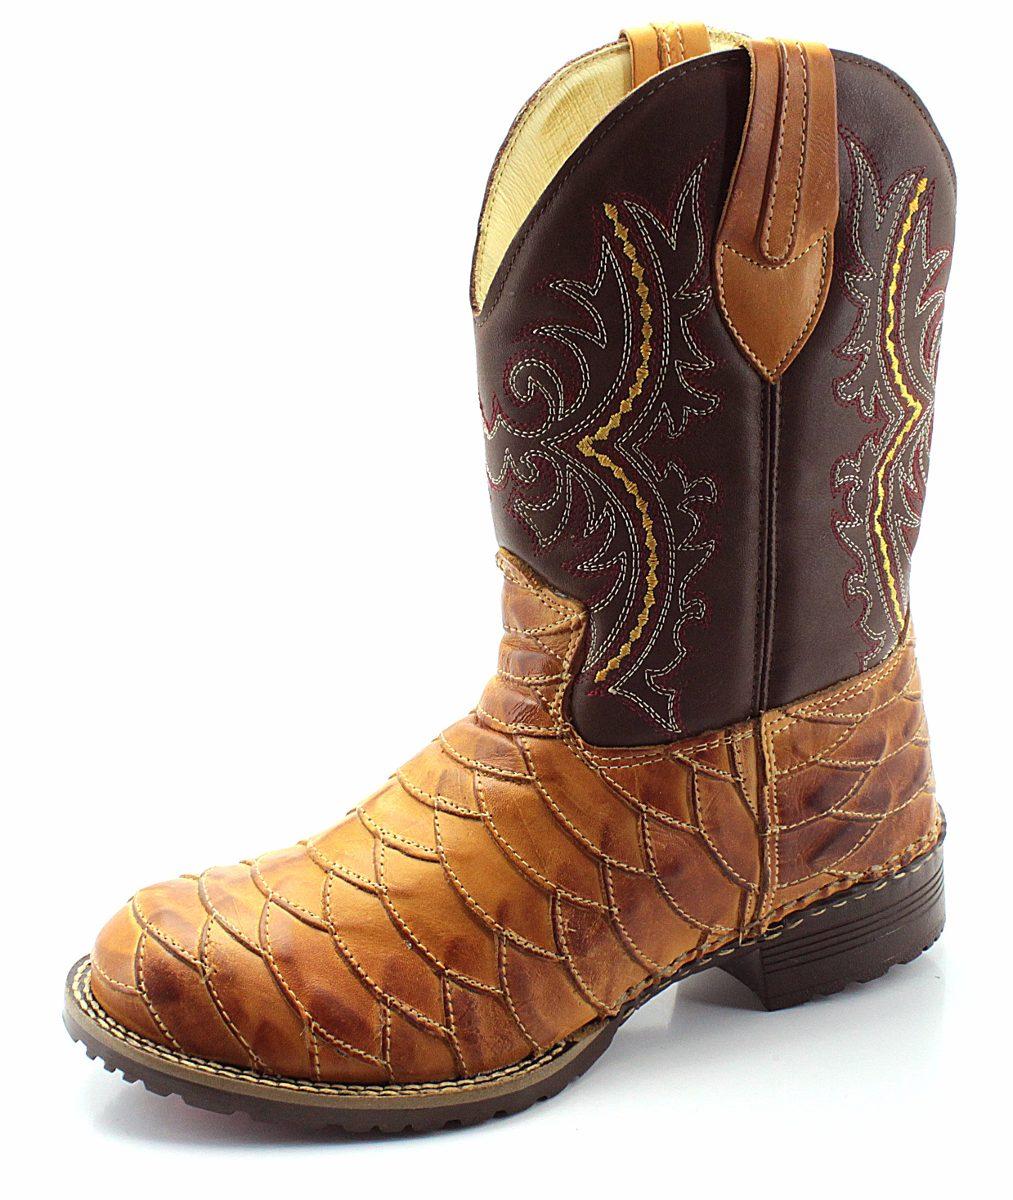 bota country masculina cano longo texana rodeio couro amarel. Carregando  zoom. 135cddd1e5a